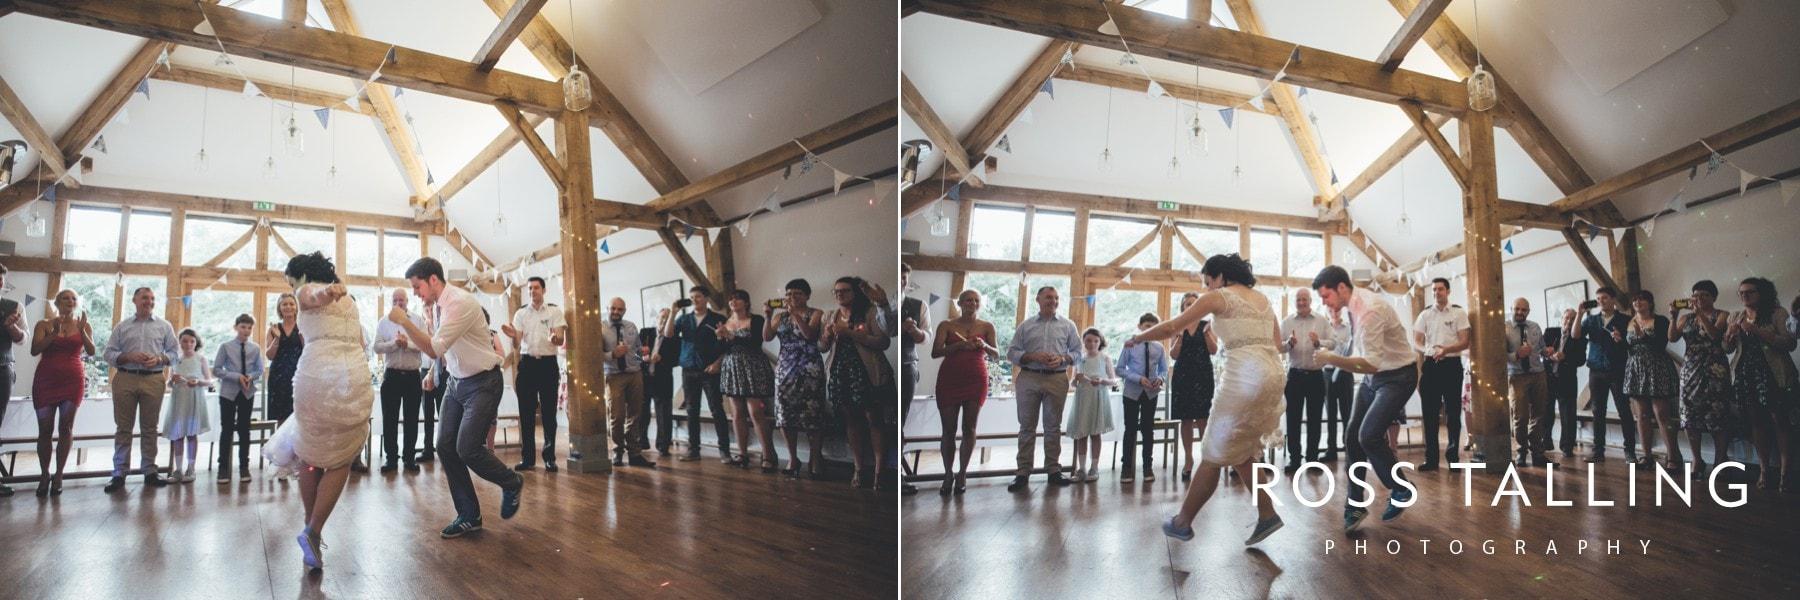 Coolest First Dance Ever Breakdancing Bride and Groom Jasmin and Ben Barnicoat_0000